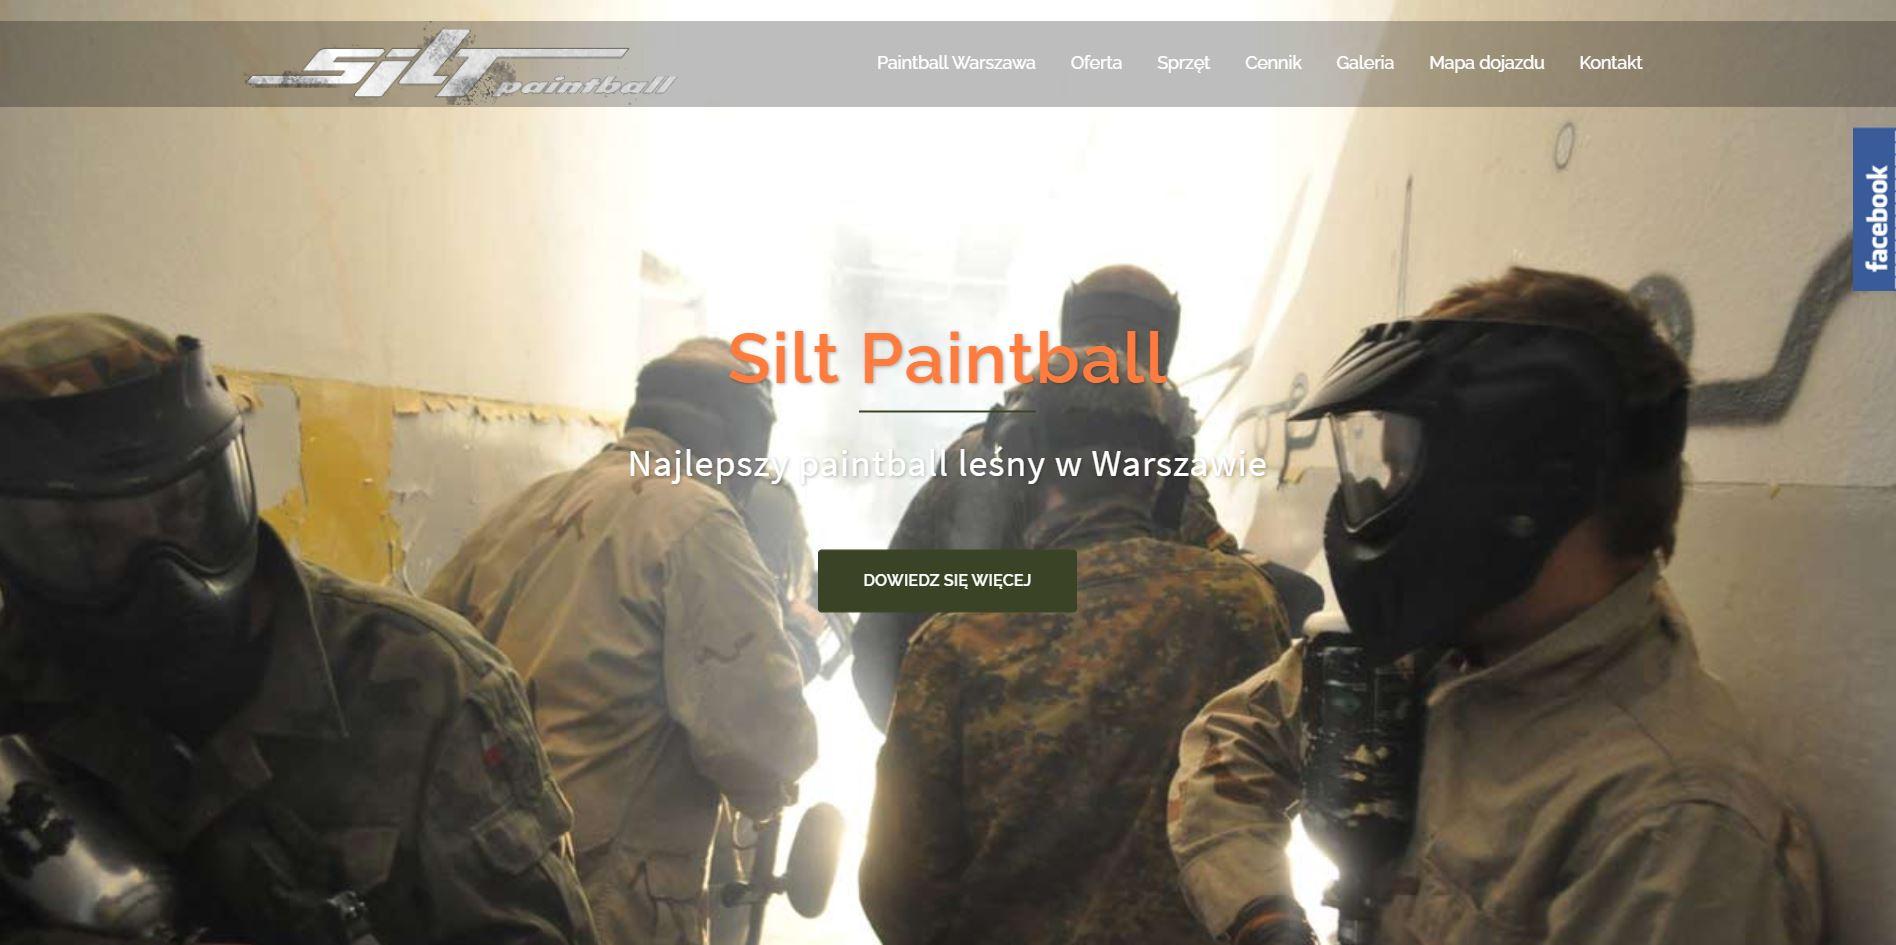 strona internetowa dla Silt Paintball